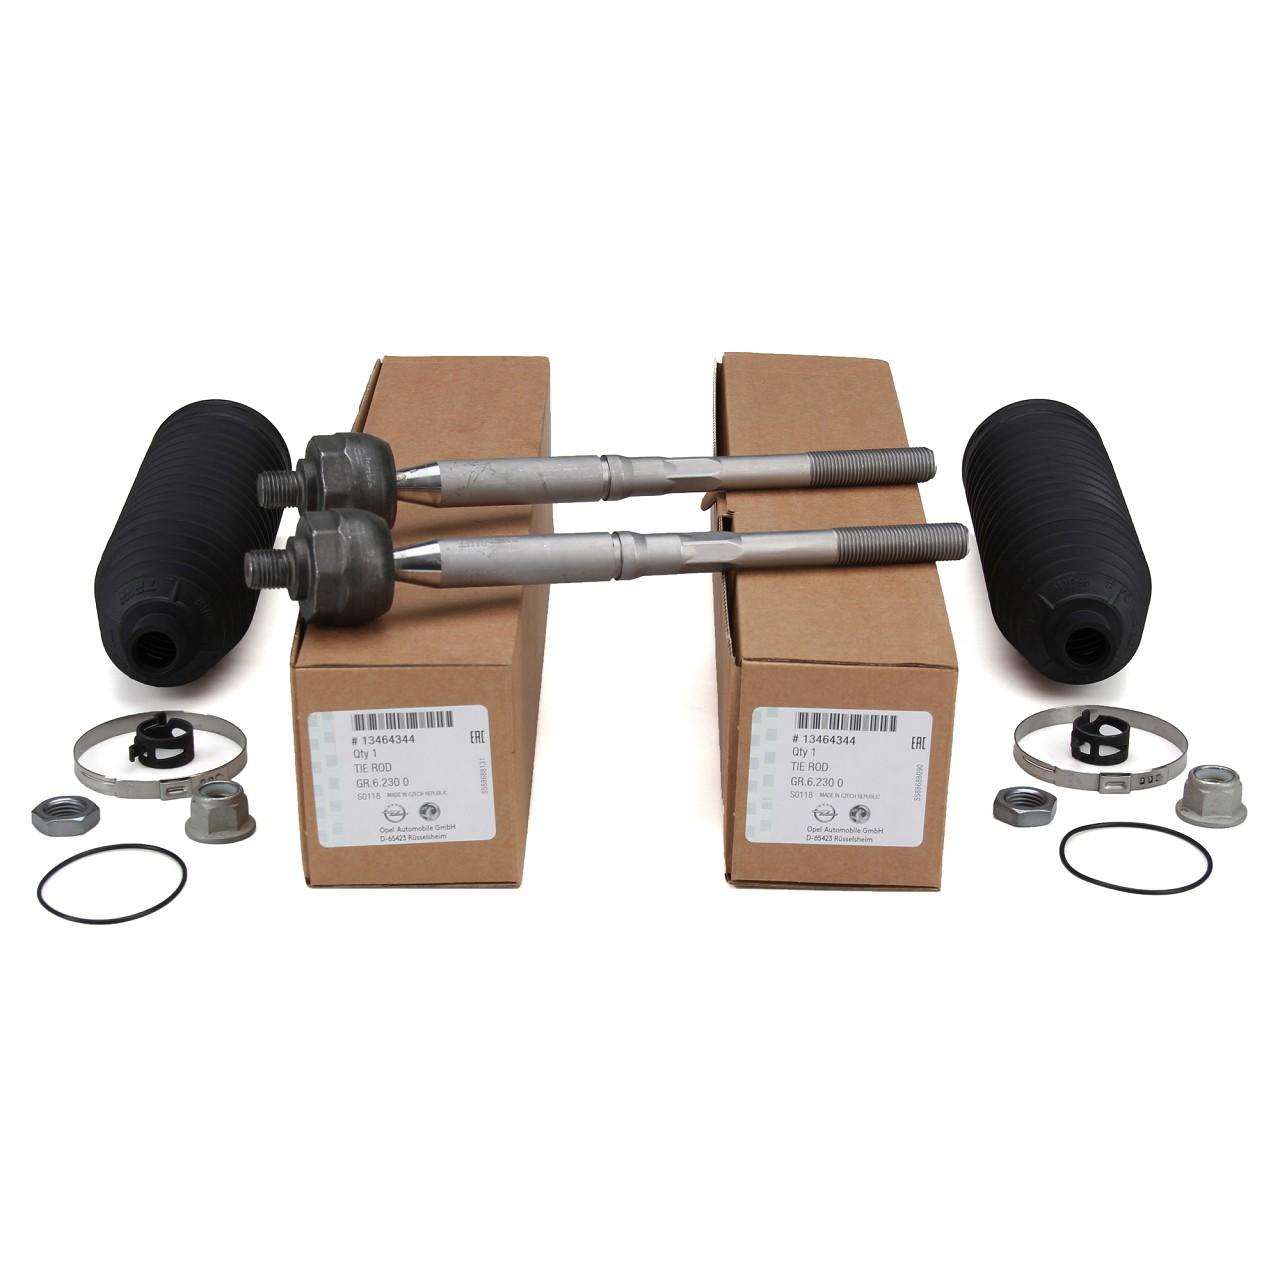 2x ORIGINAL Opel Spurstange Axialgelenk ASTRA K (B16) vorne 13464344